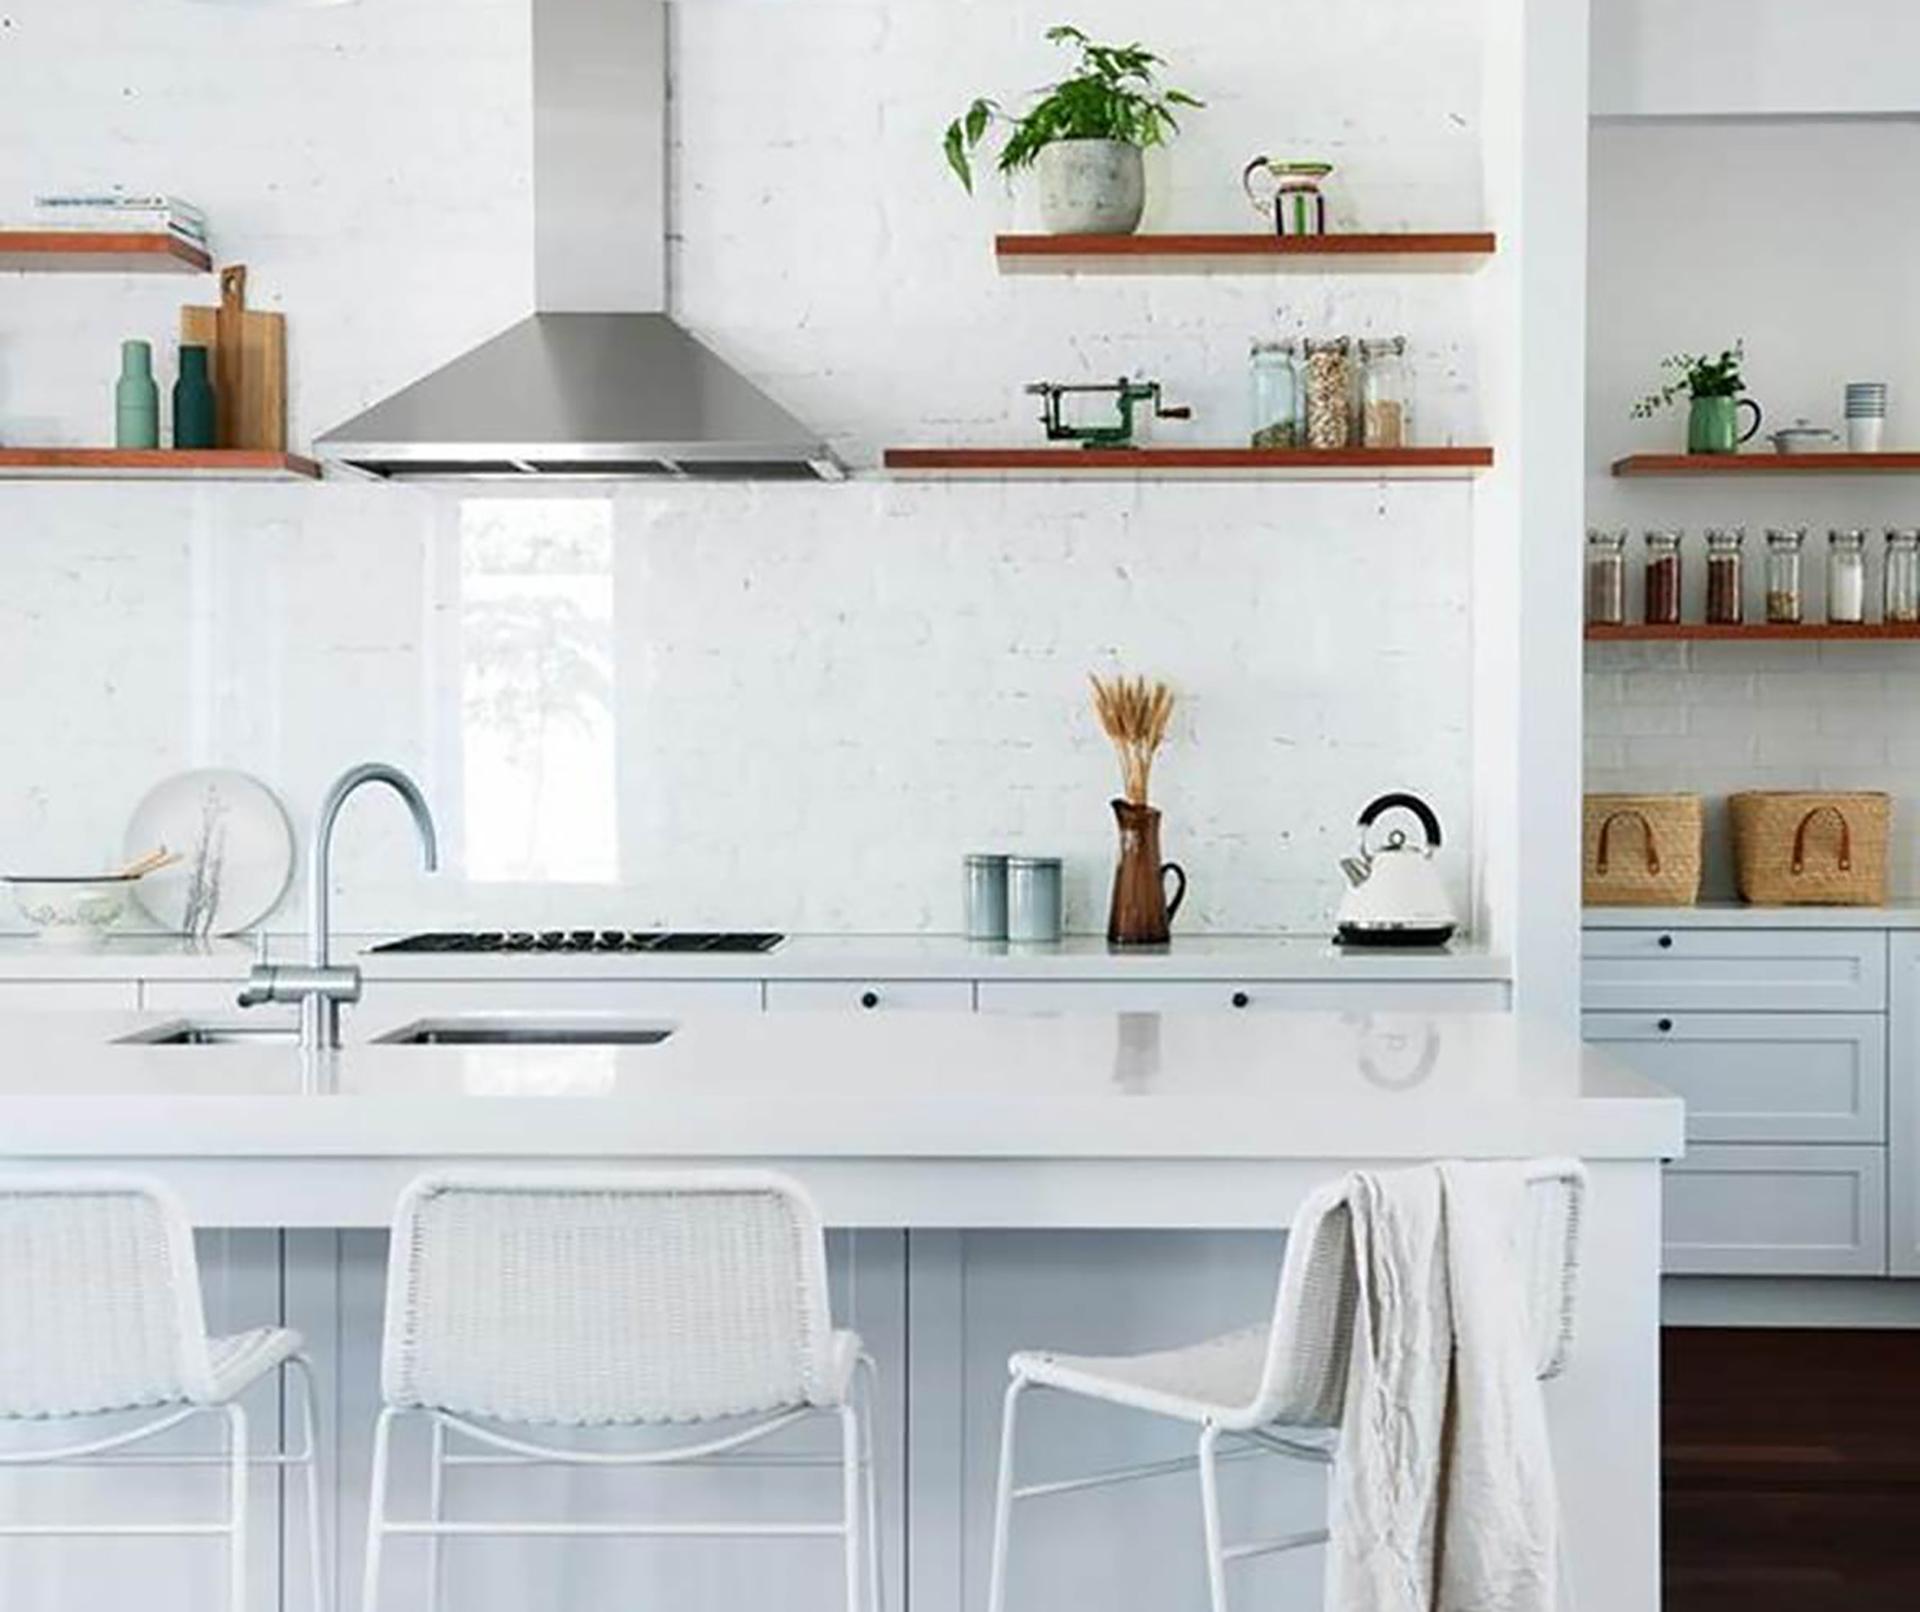 Declutter kitchen: How to declutter your kitchen | Australian House and Garden